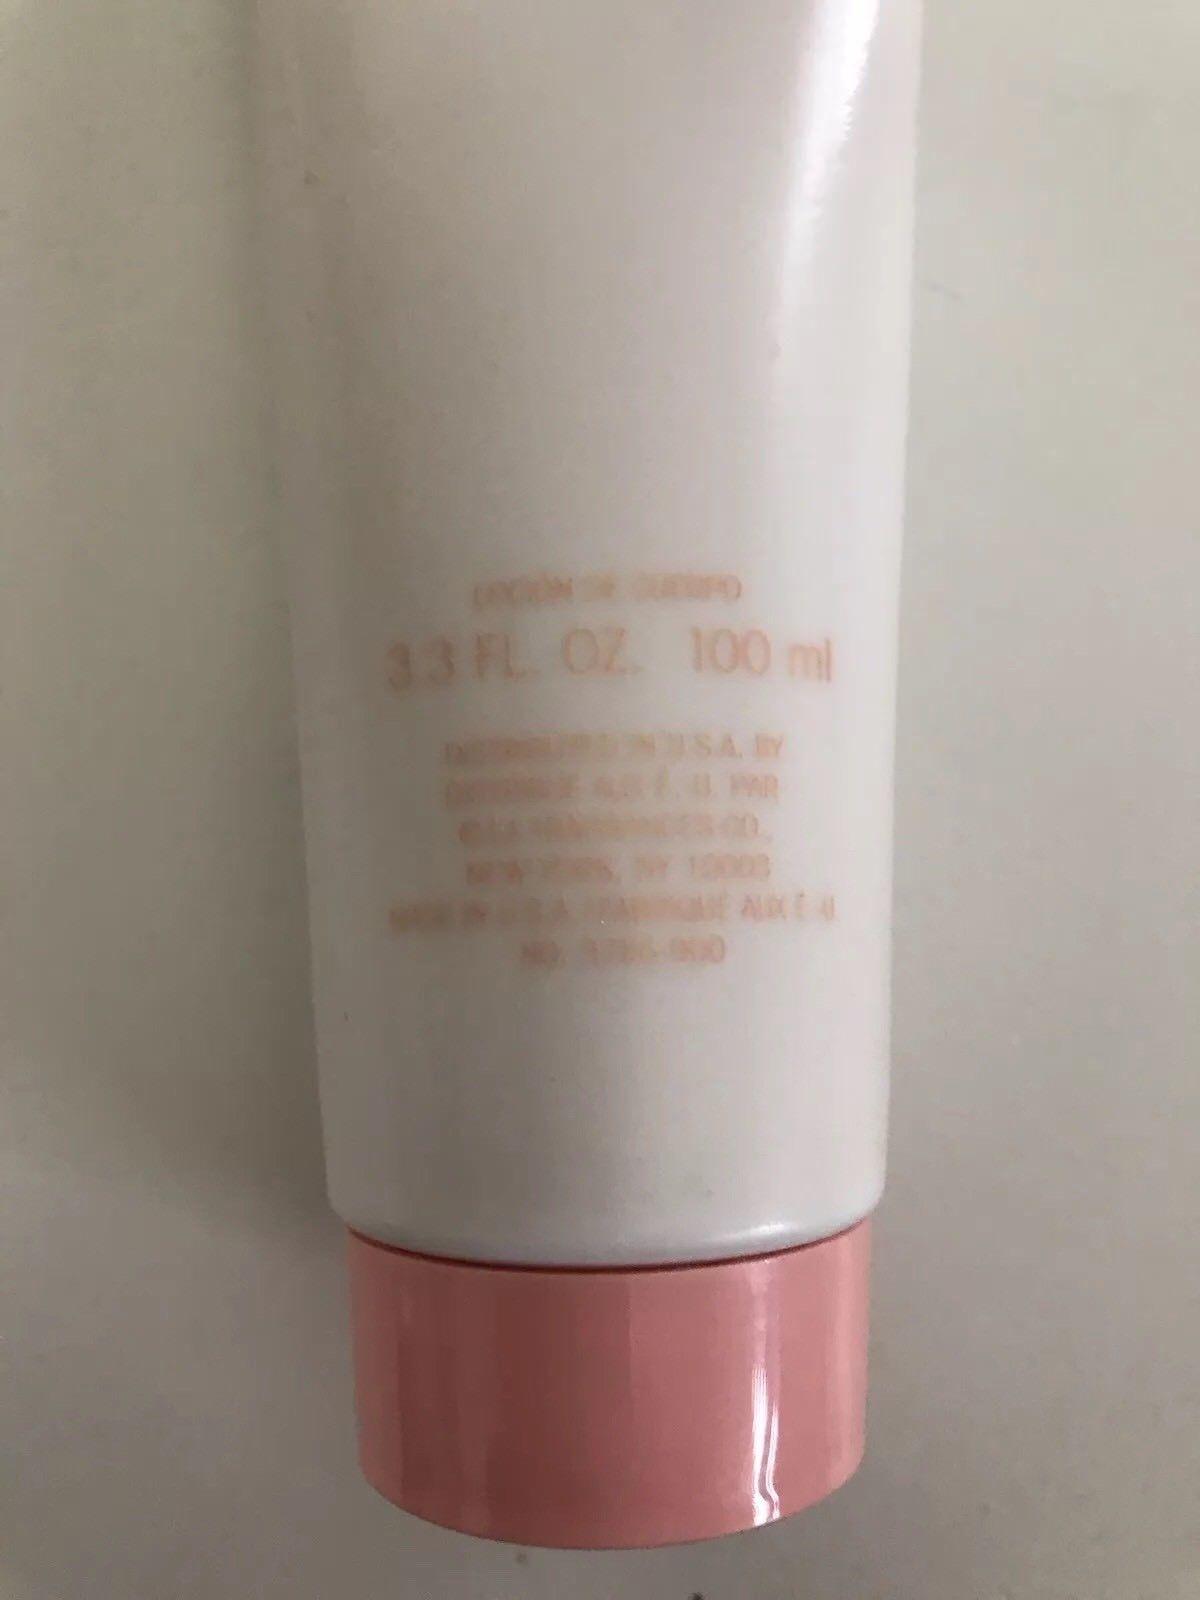 White Shoulders Perfumed Body lotion ~3.3 oz